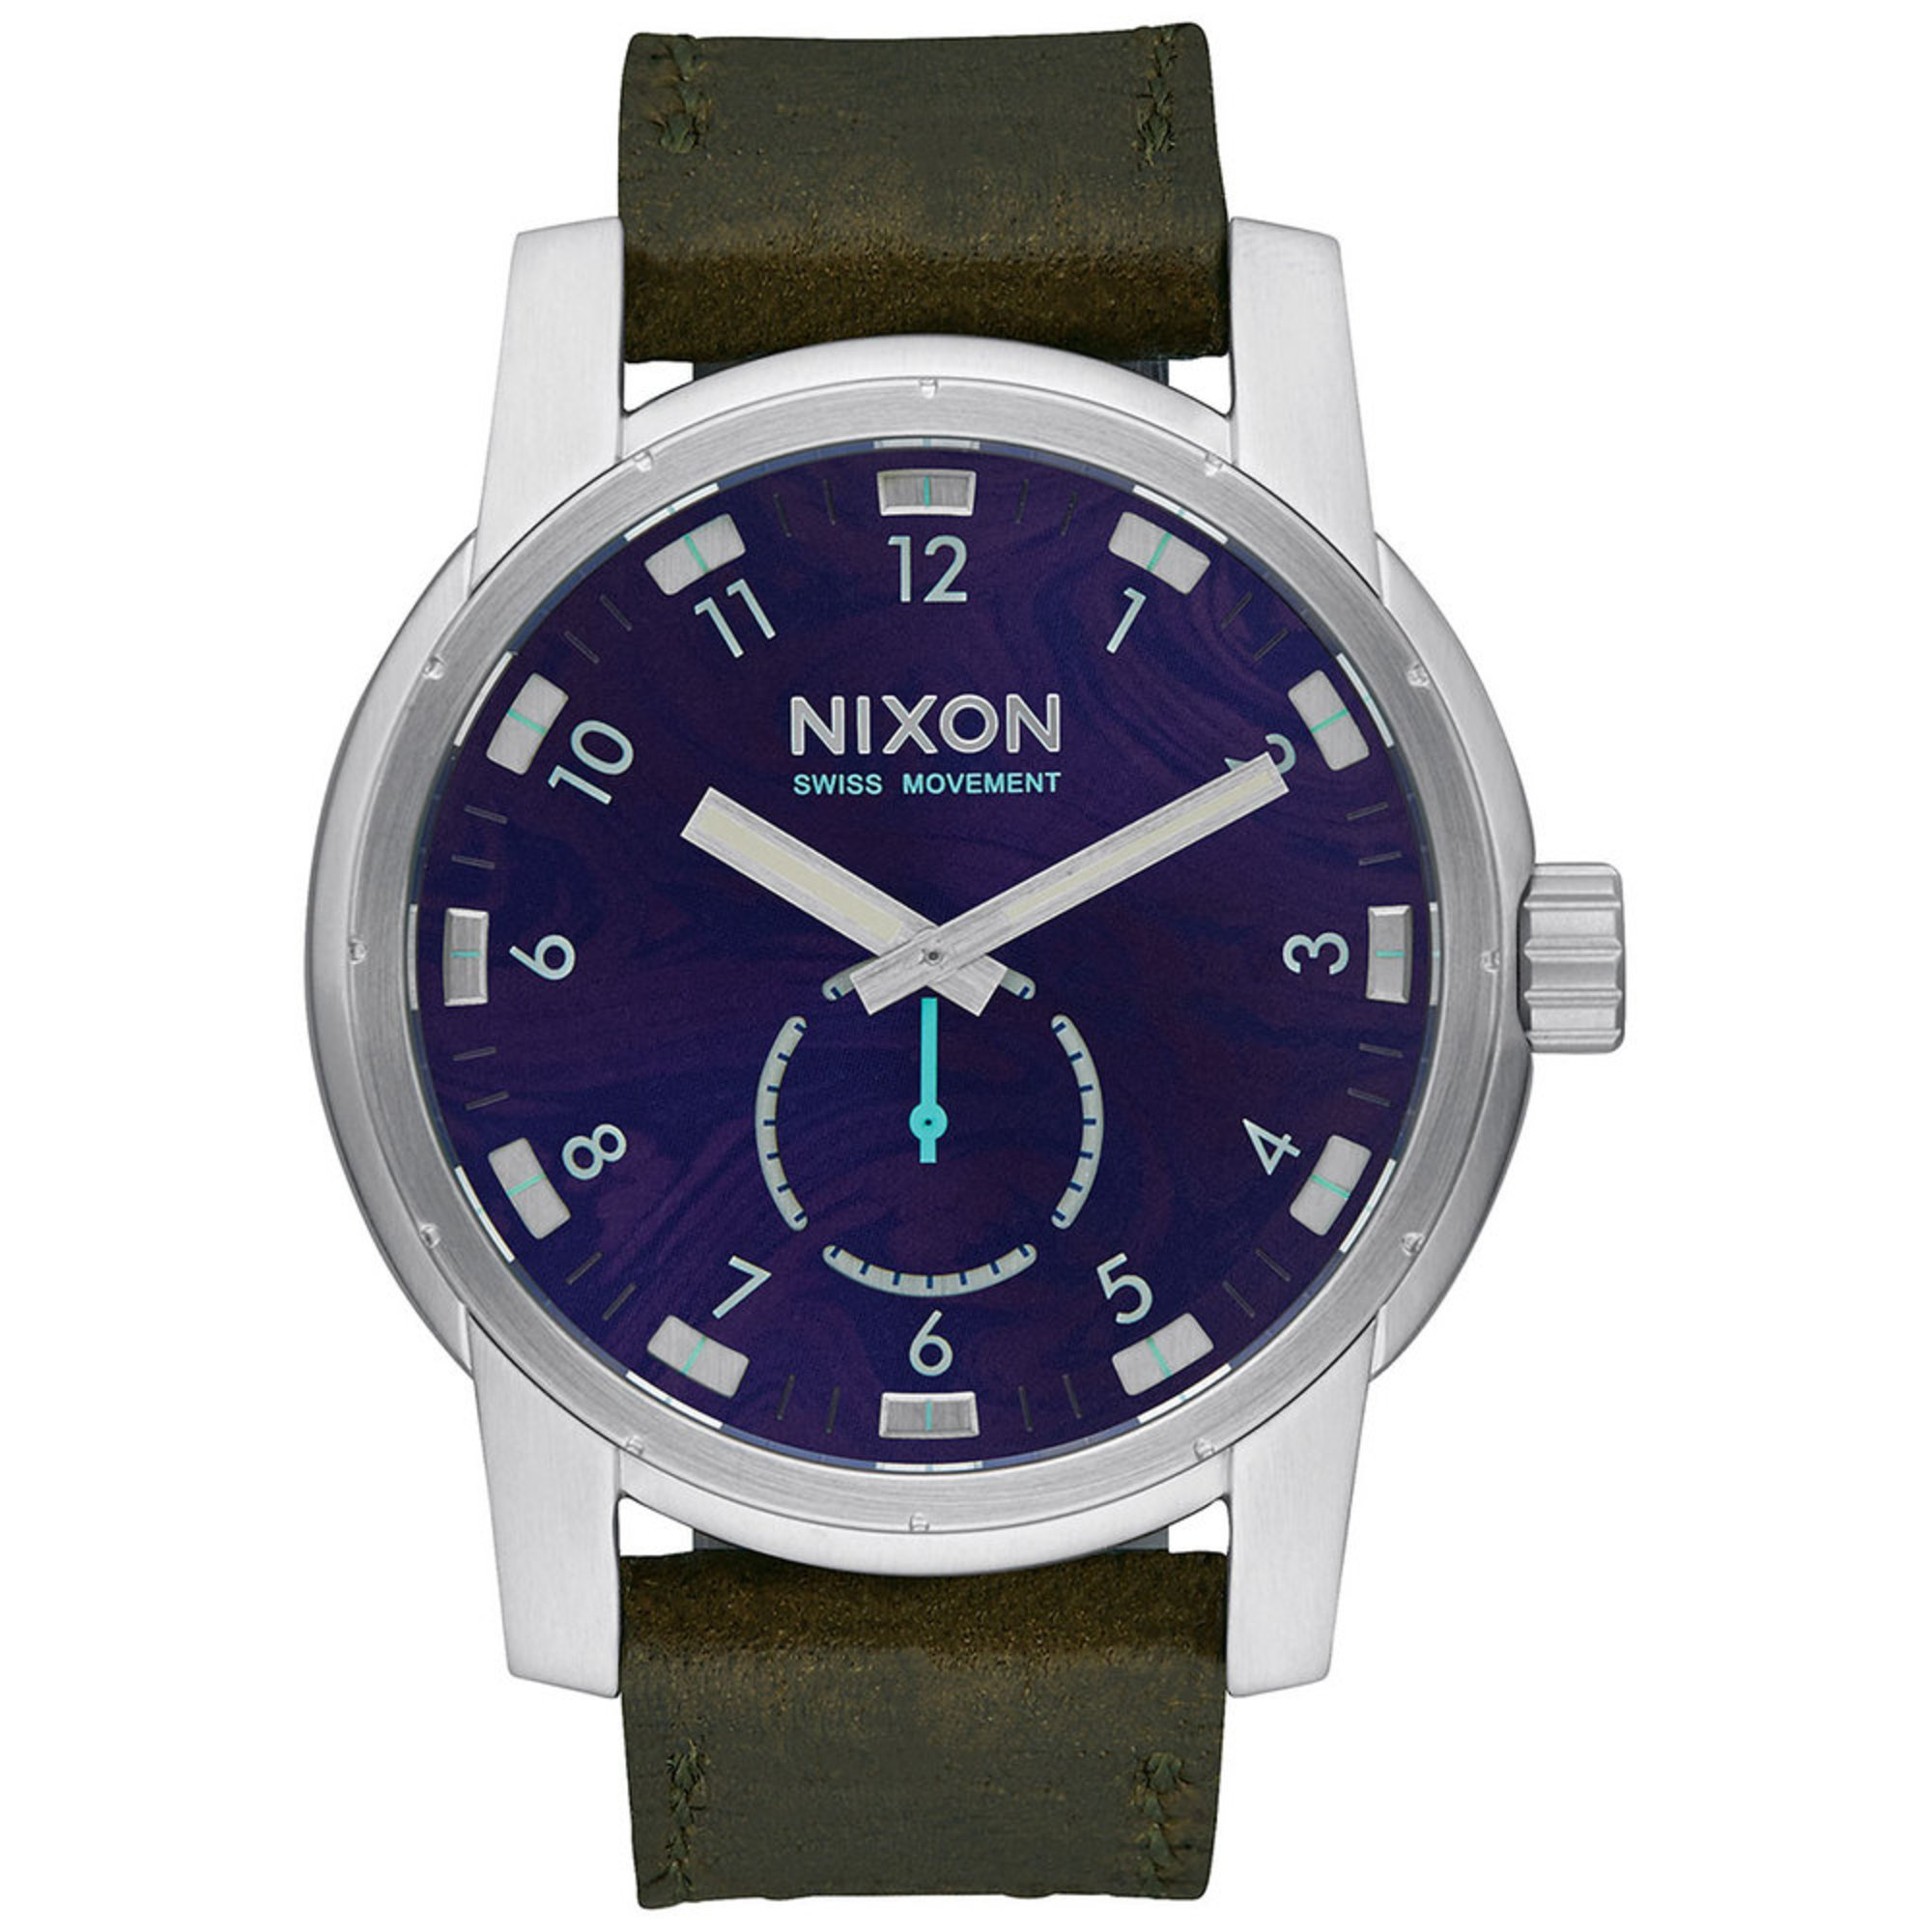 nixon replacement band   eBay